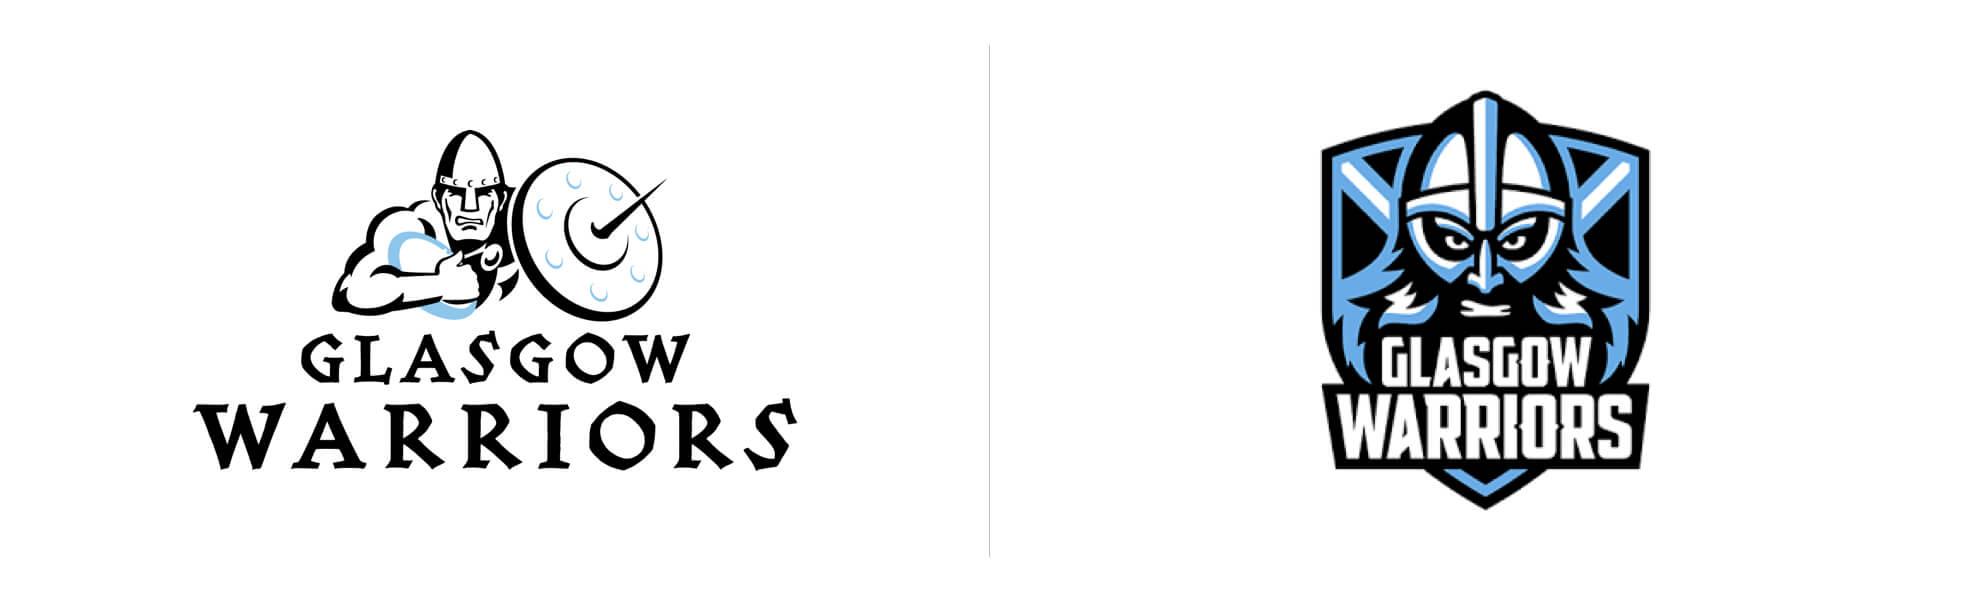 nowe istare logo glasgow warriors